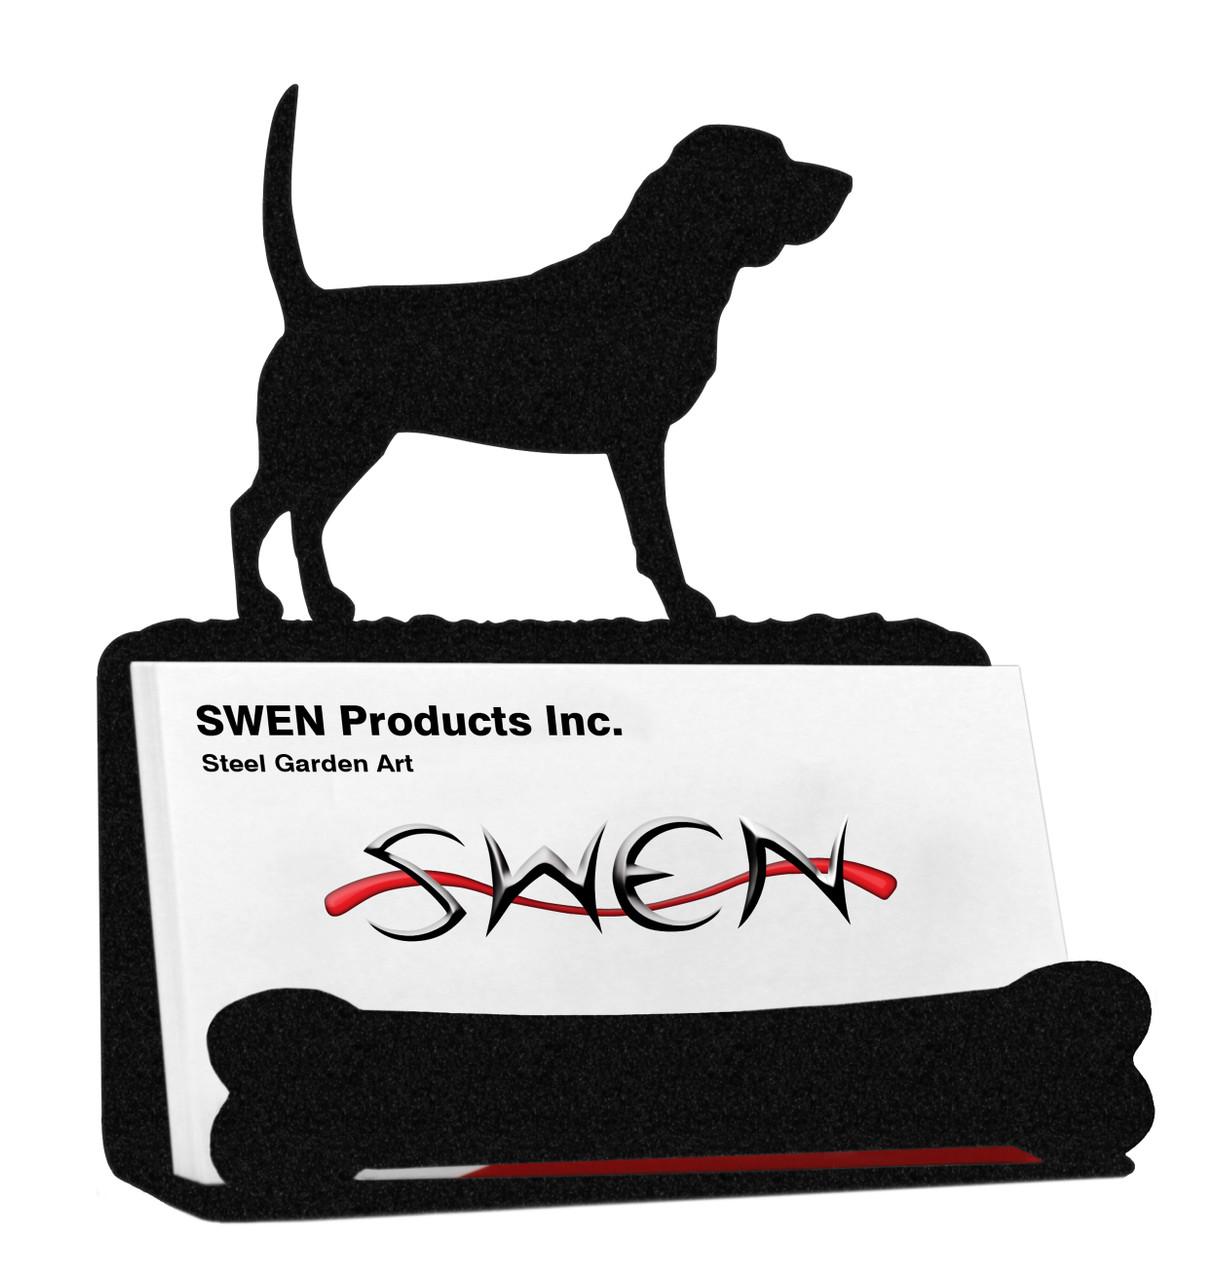 SWEN Products BOSTON TERRIER Dog Black Metal Business Card Holder